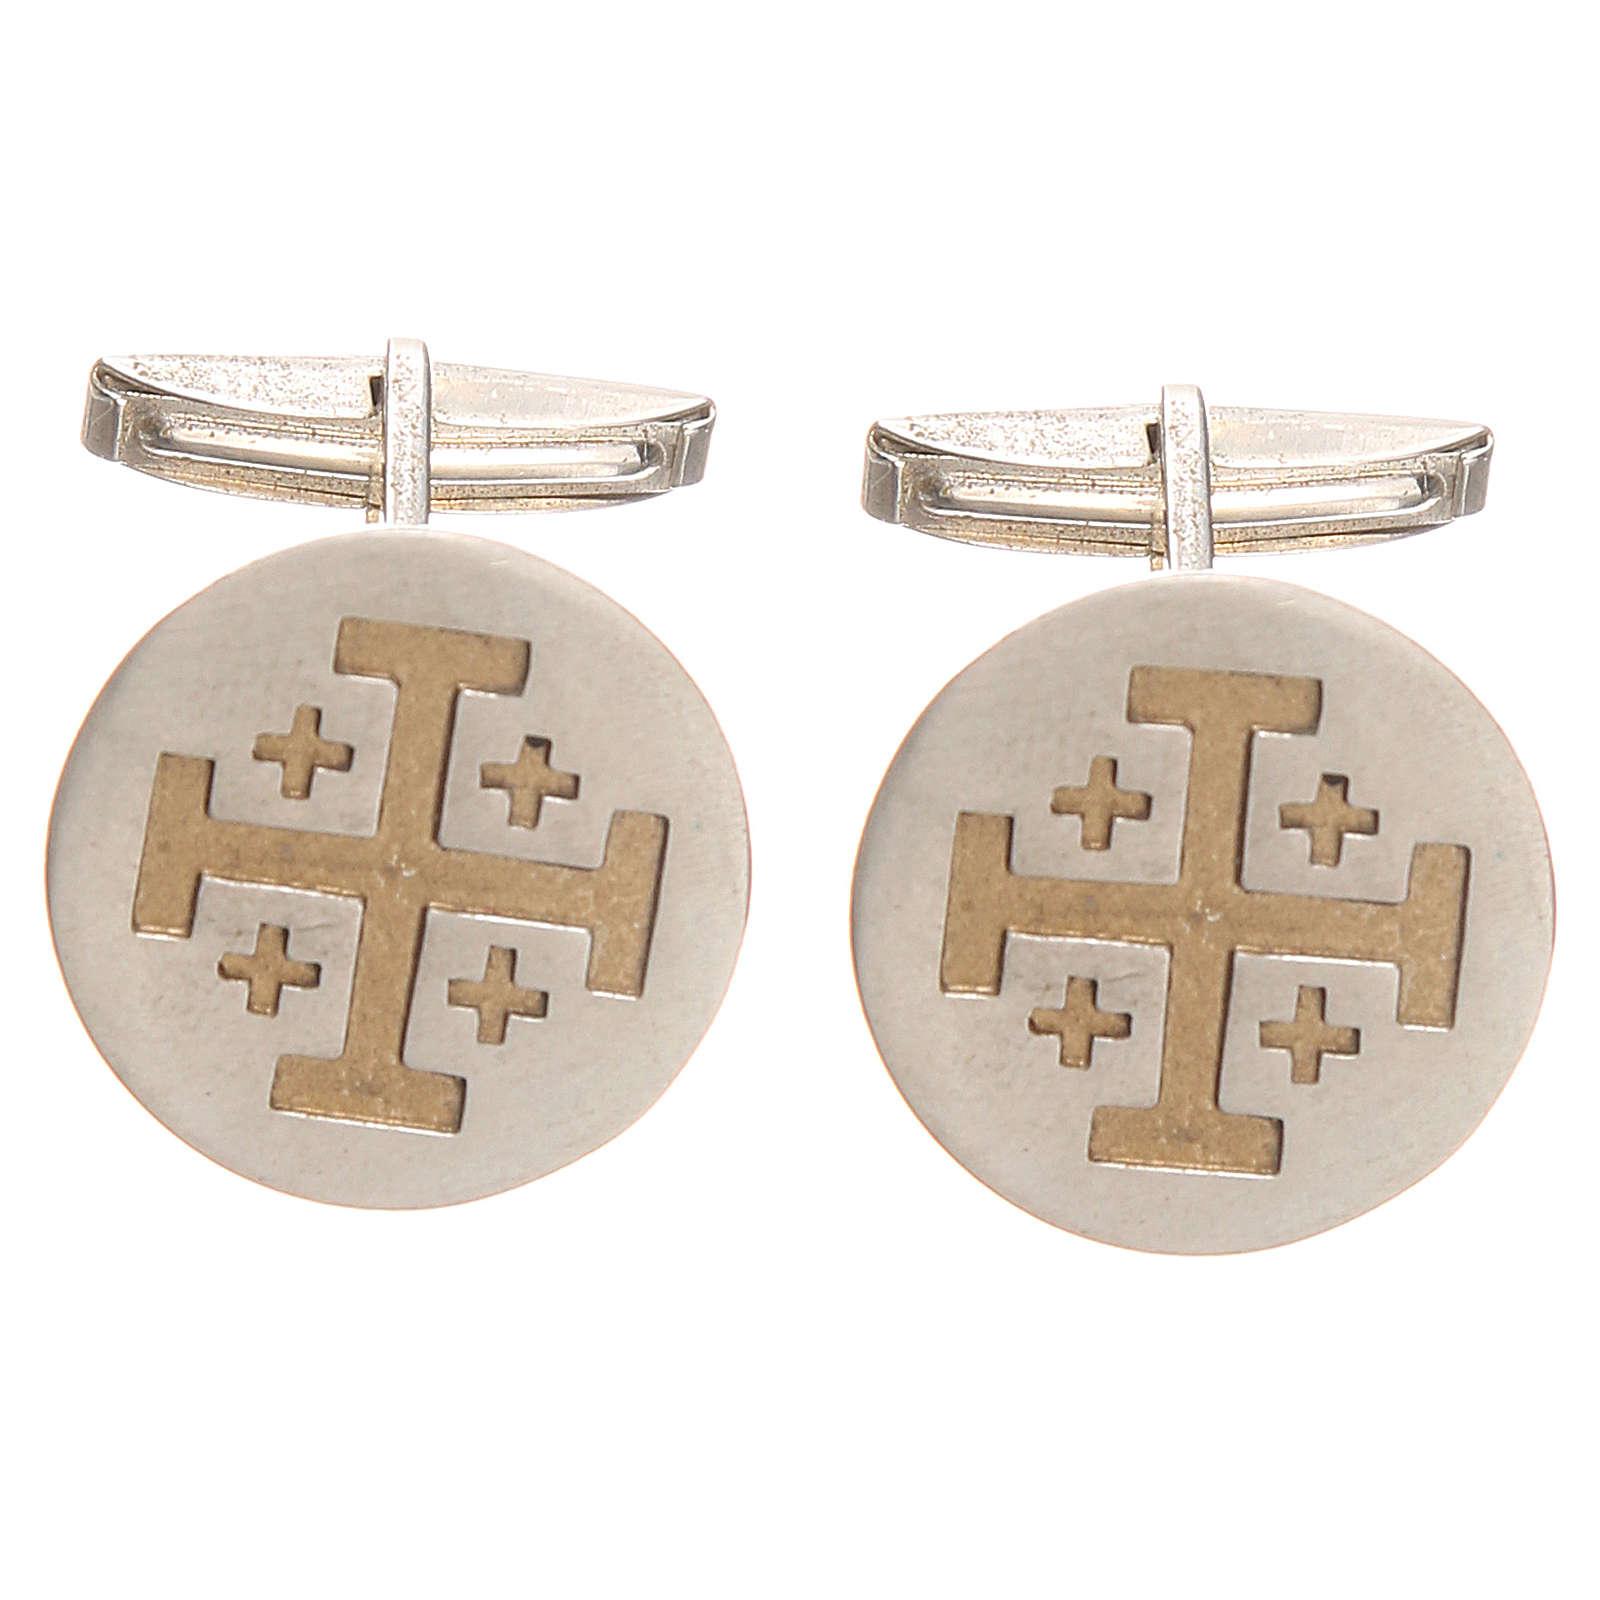 Gemelli camicia argento 800 rodiato Croce Gerusalemme 1,9 cm 4